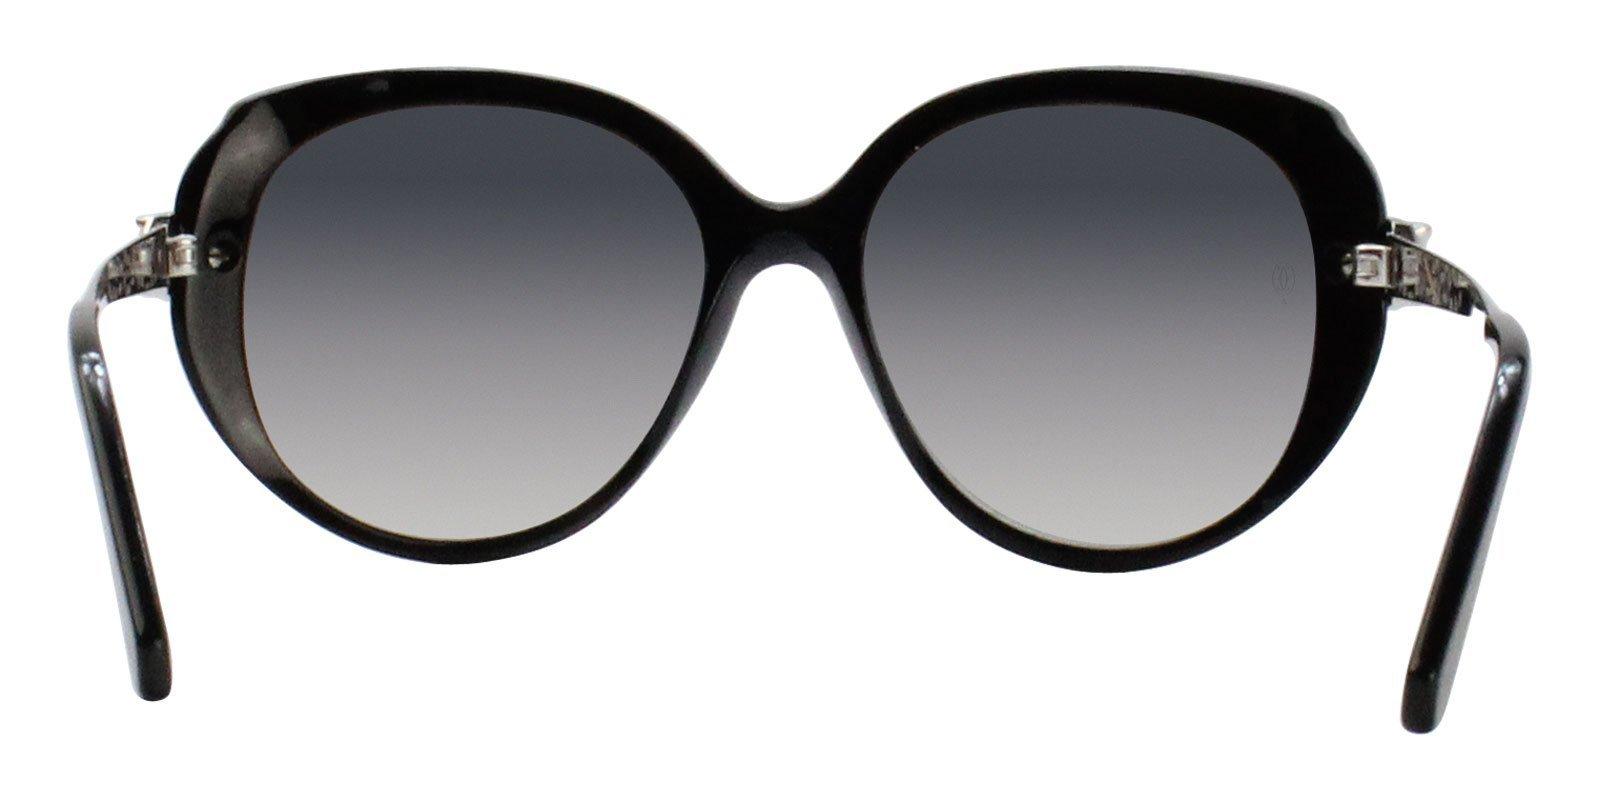 6e652deb5e Cartier - Panthere Wild ESW00123 Sunglasses